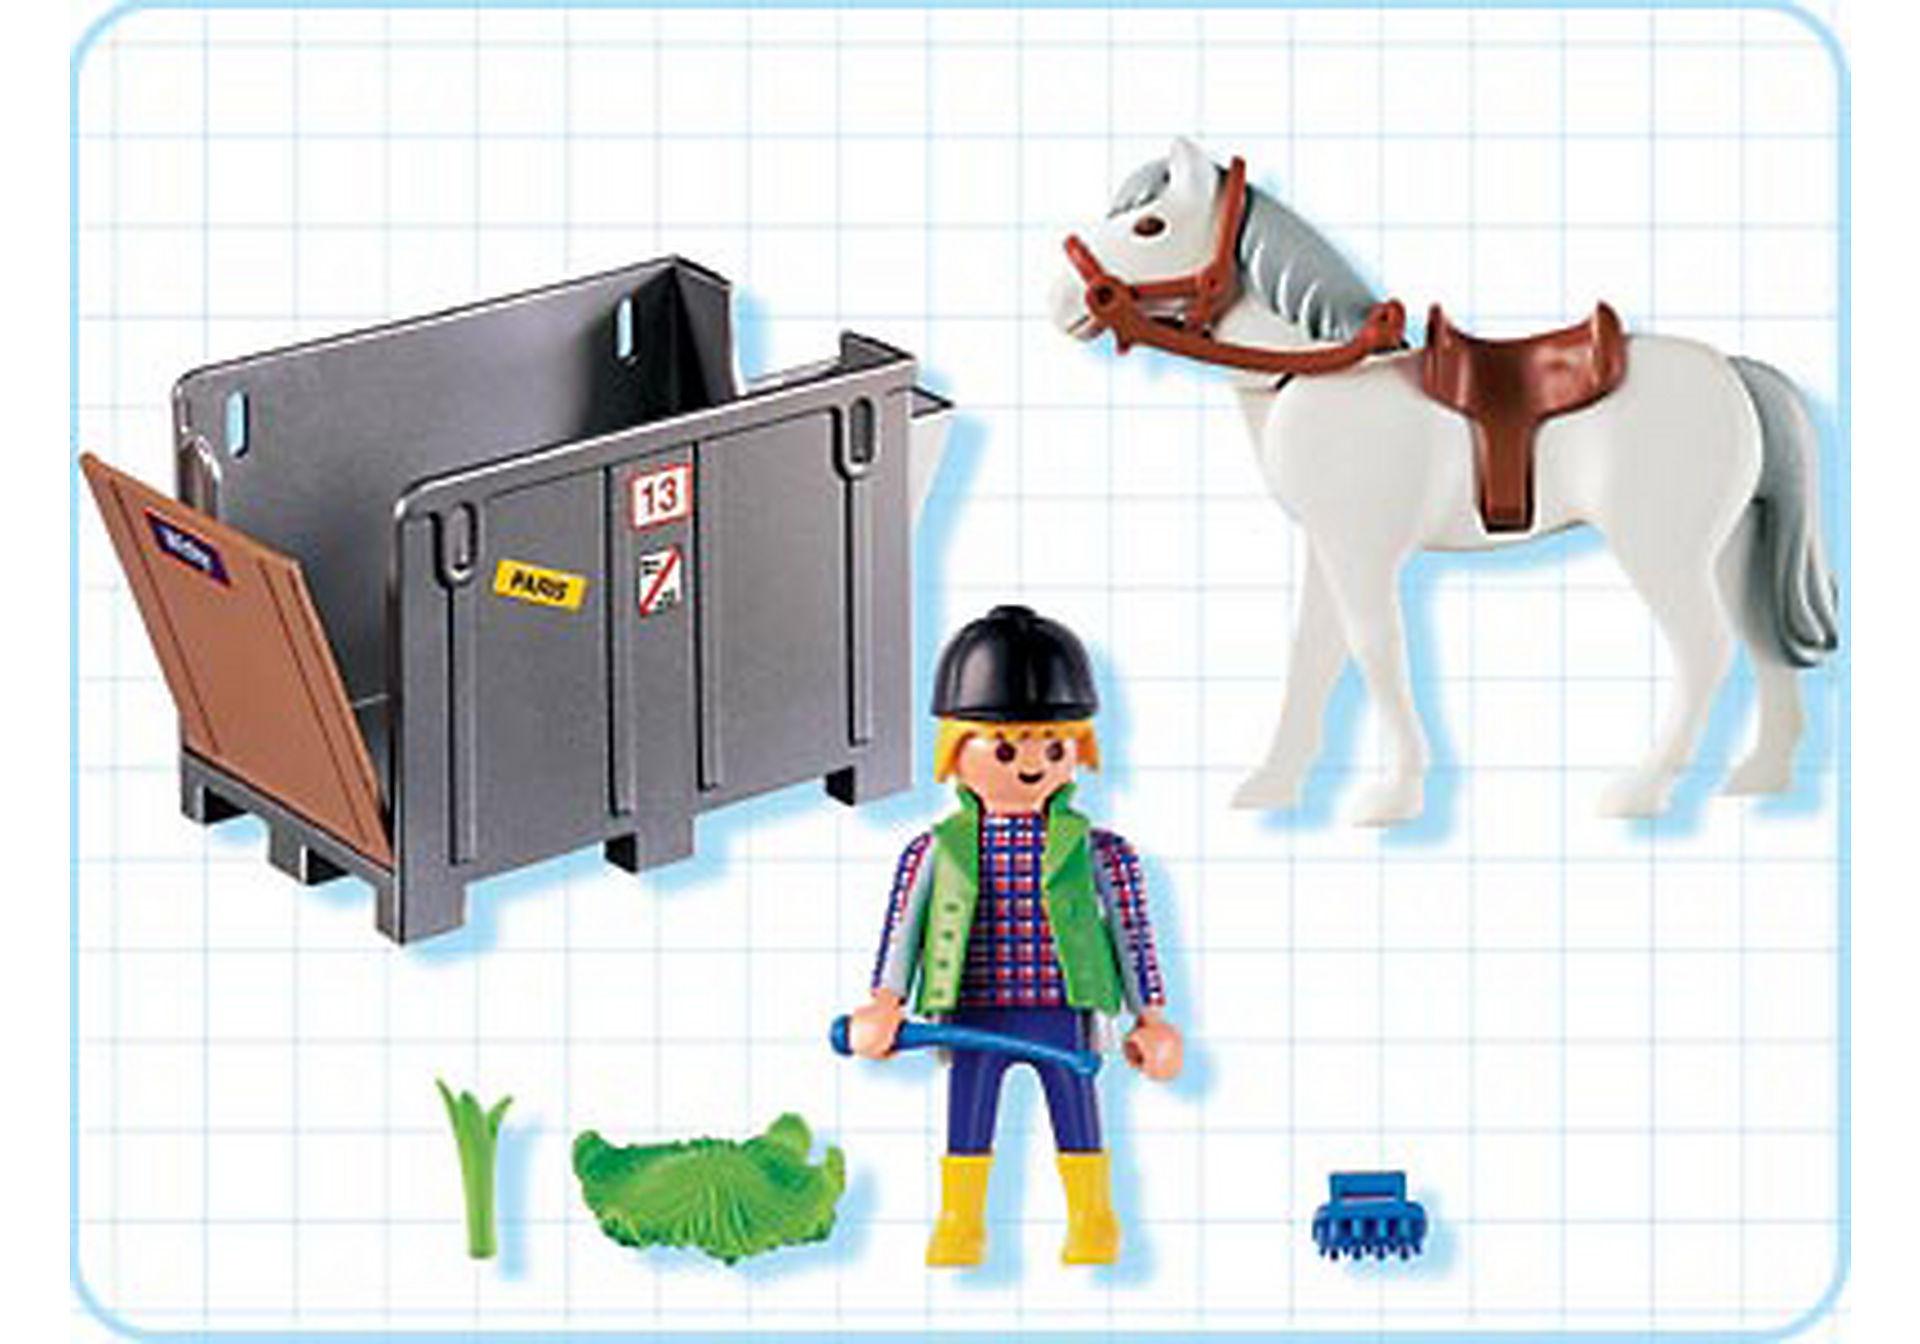 4316-A Transportbox mit Pferd zoom image2